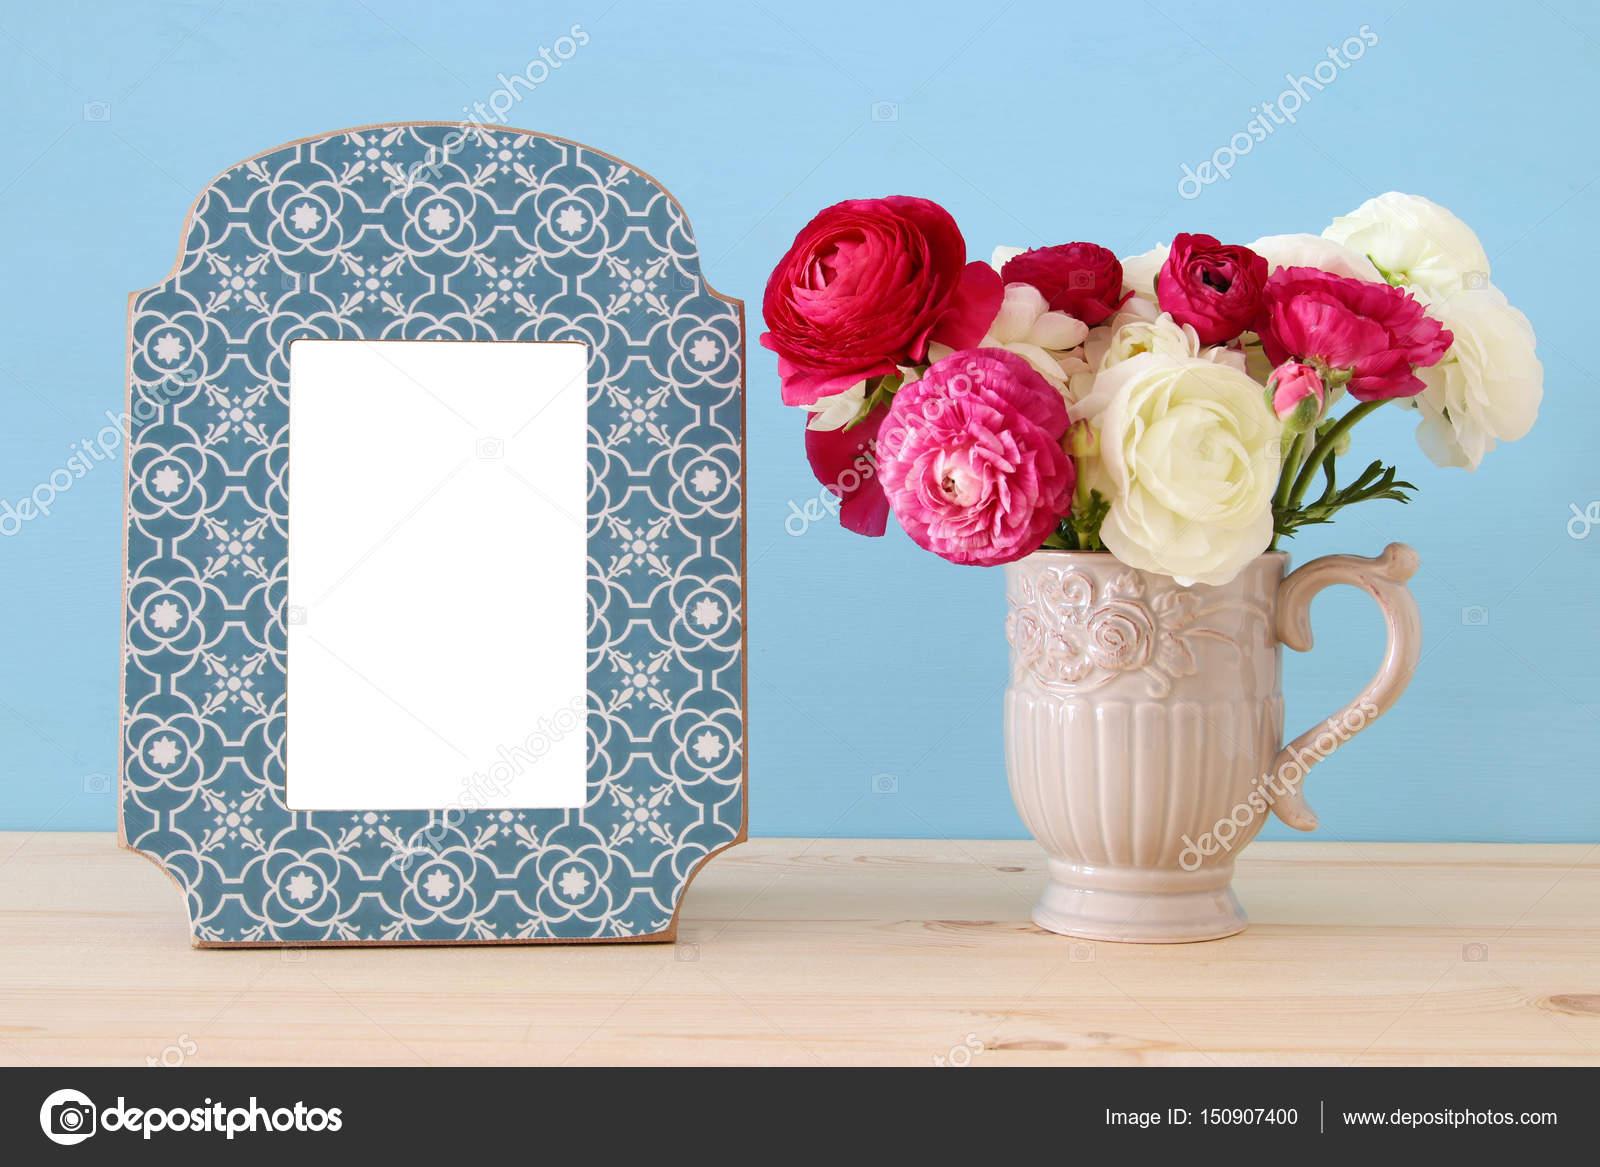 Strauß Frühlingsblumen neben leeren Vintage Bilderrahmen — Stockfoto ...